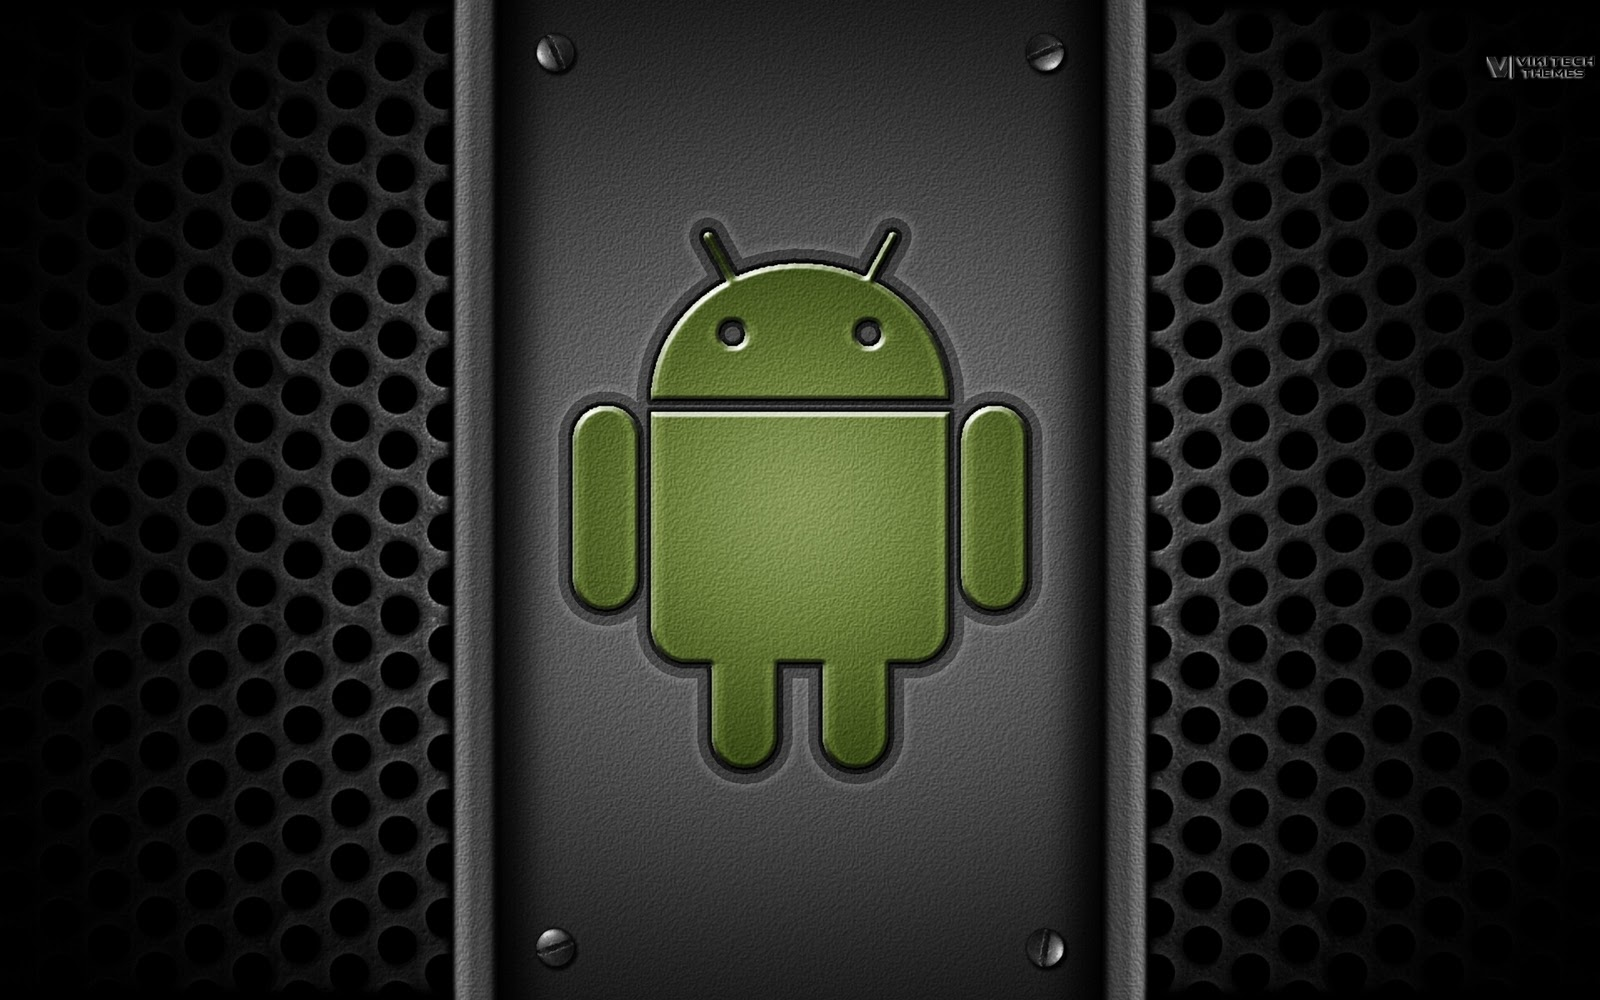 http://2.bp.blogspot.com/_E26Ndy_oKVc/TPlpzKY9BUI/AAAAAAAAAxI/zKFuI1Q8XuM/s1600/Wallpaper+Android+%25287%2529.jpg